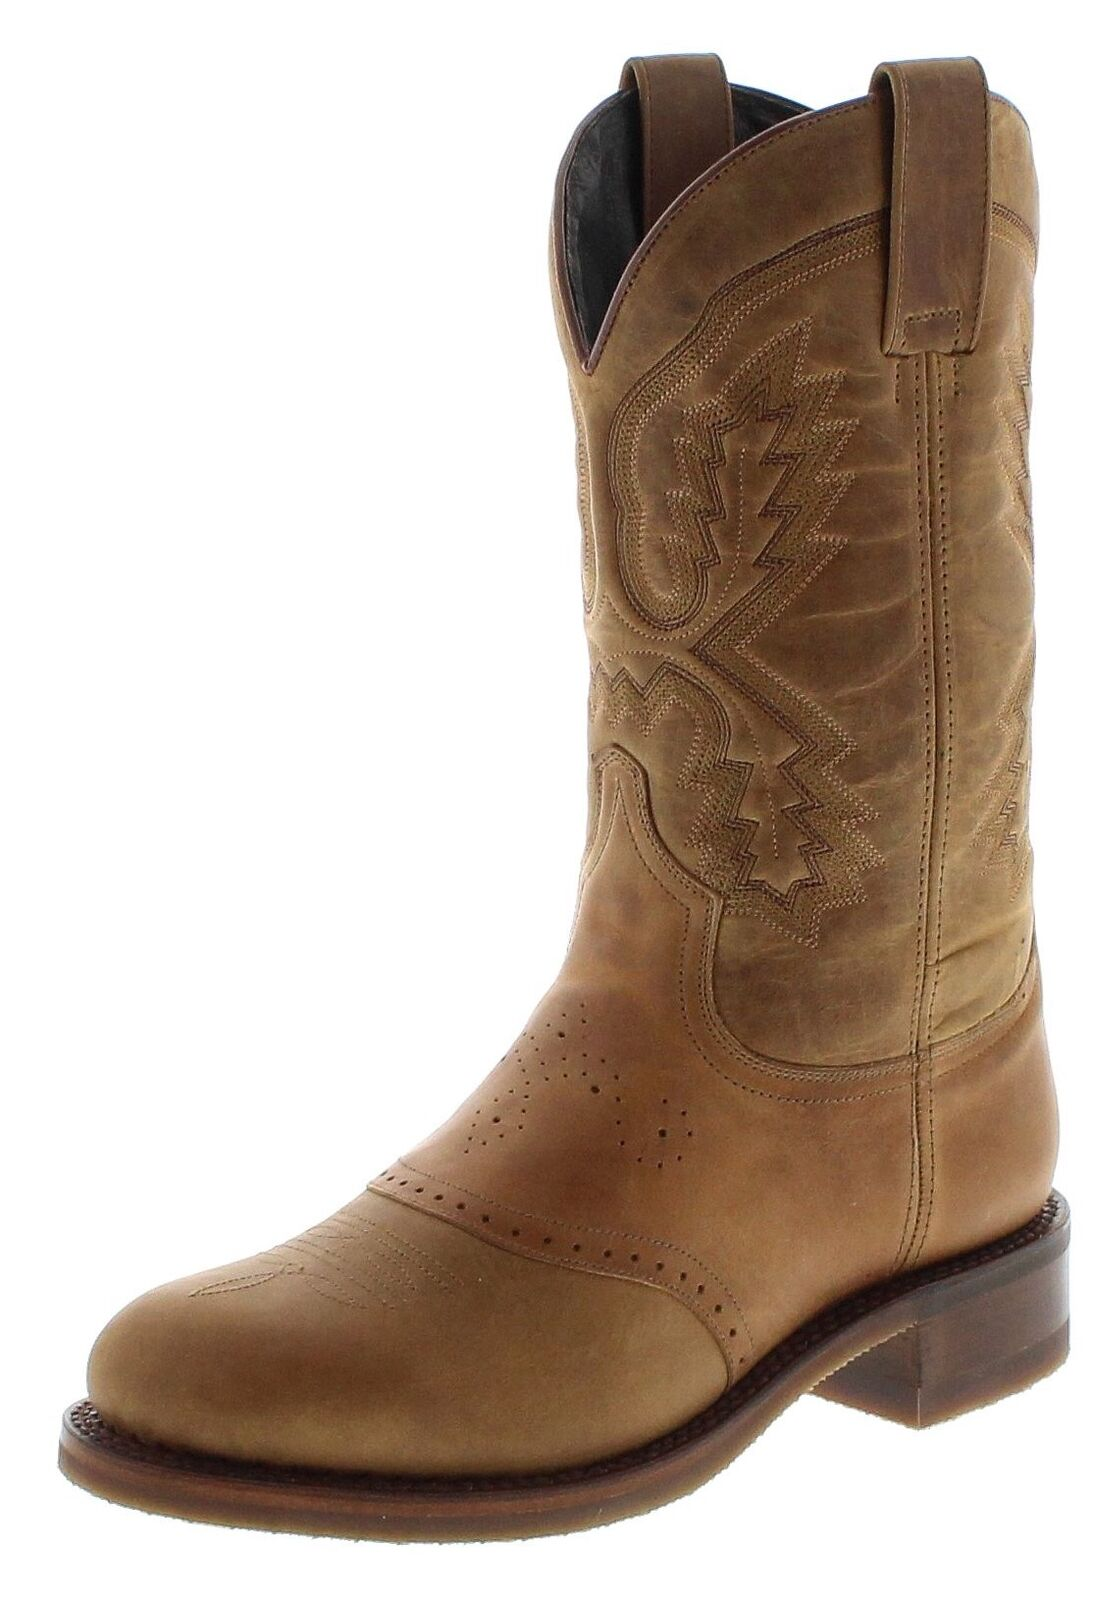 Sendra botas eyak marrón westernreitbotas con thinsulate Insulation aislamiento